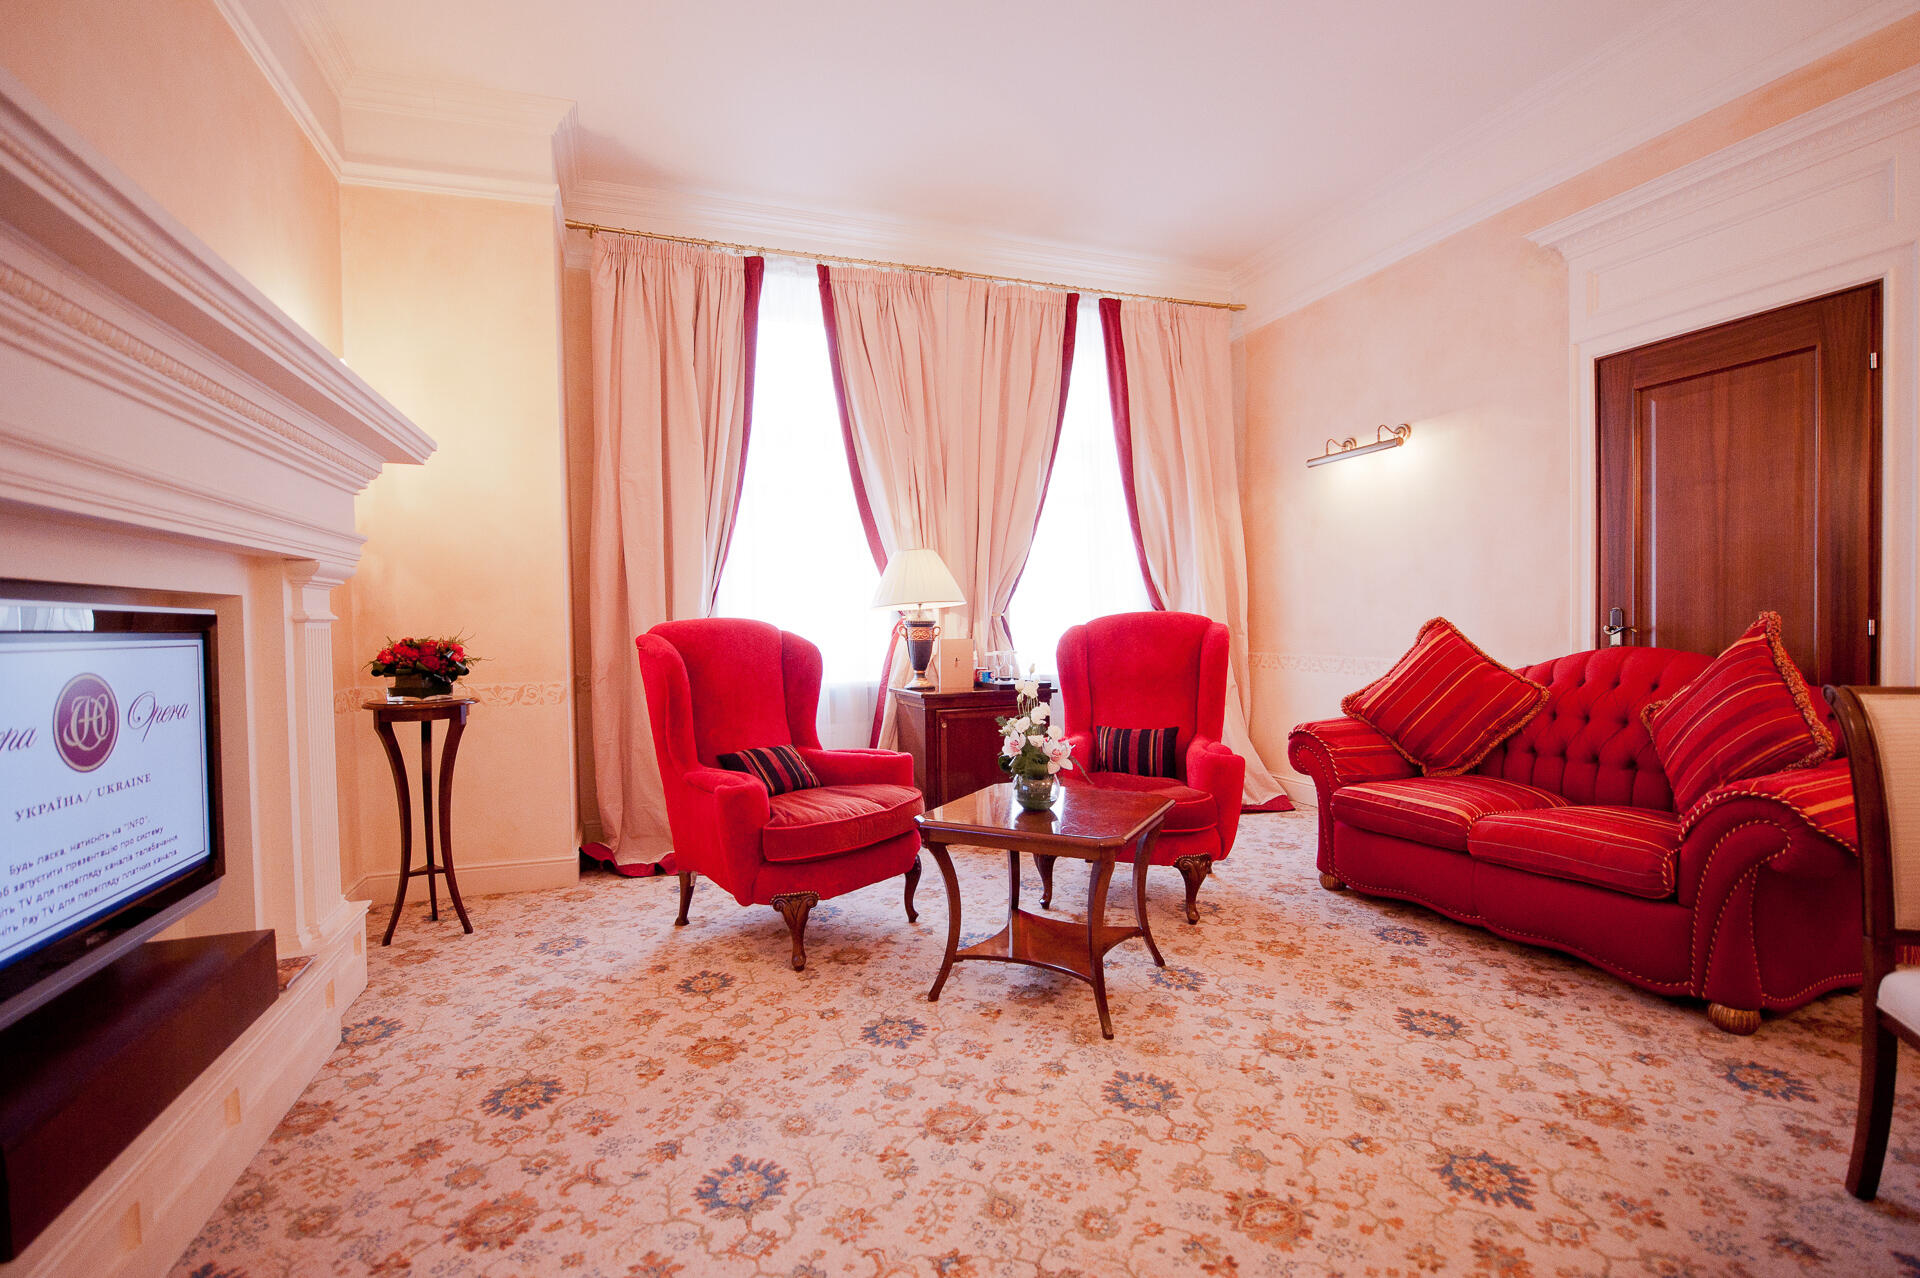 Accommodation at Opera Hotel in Kyiv